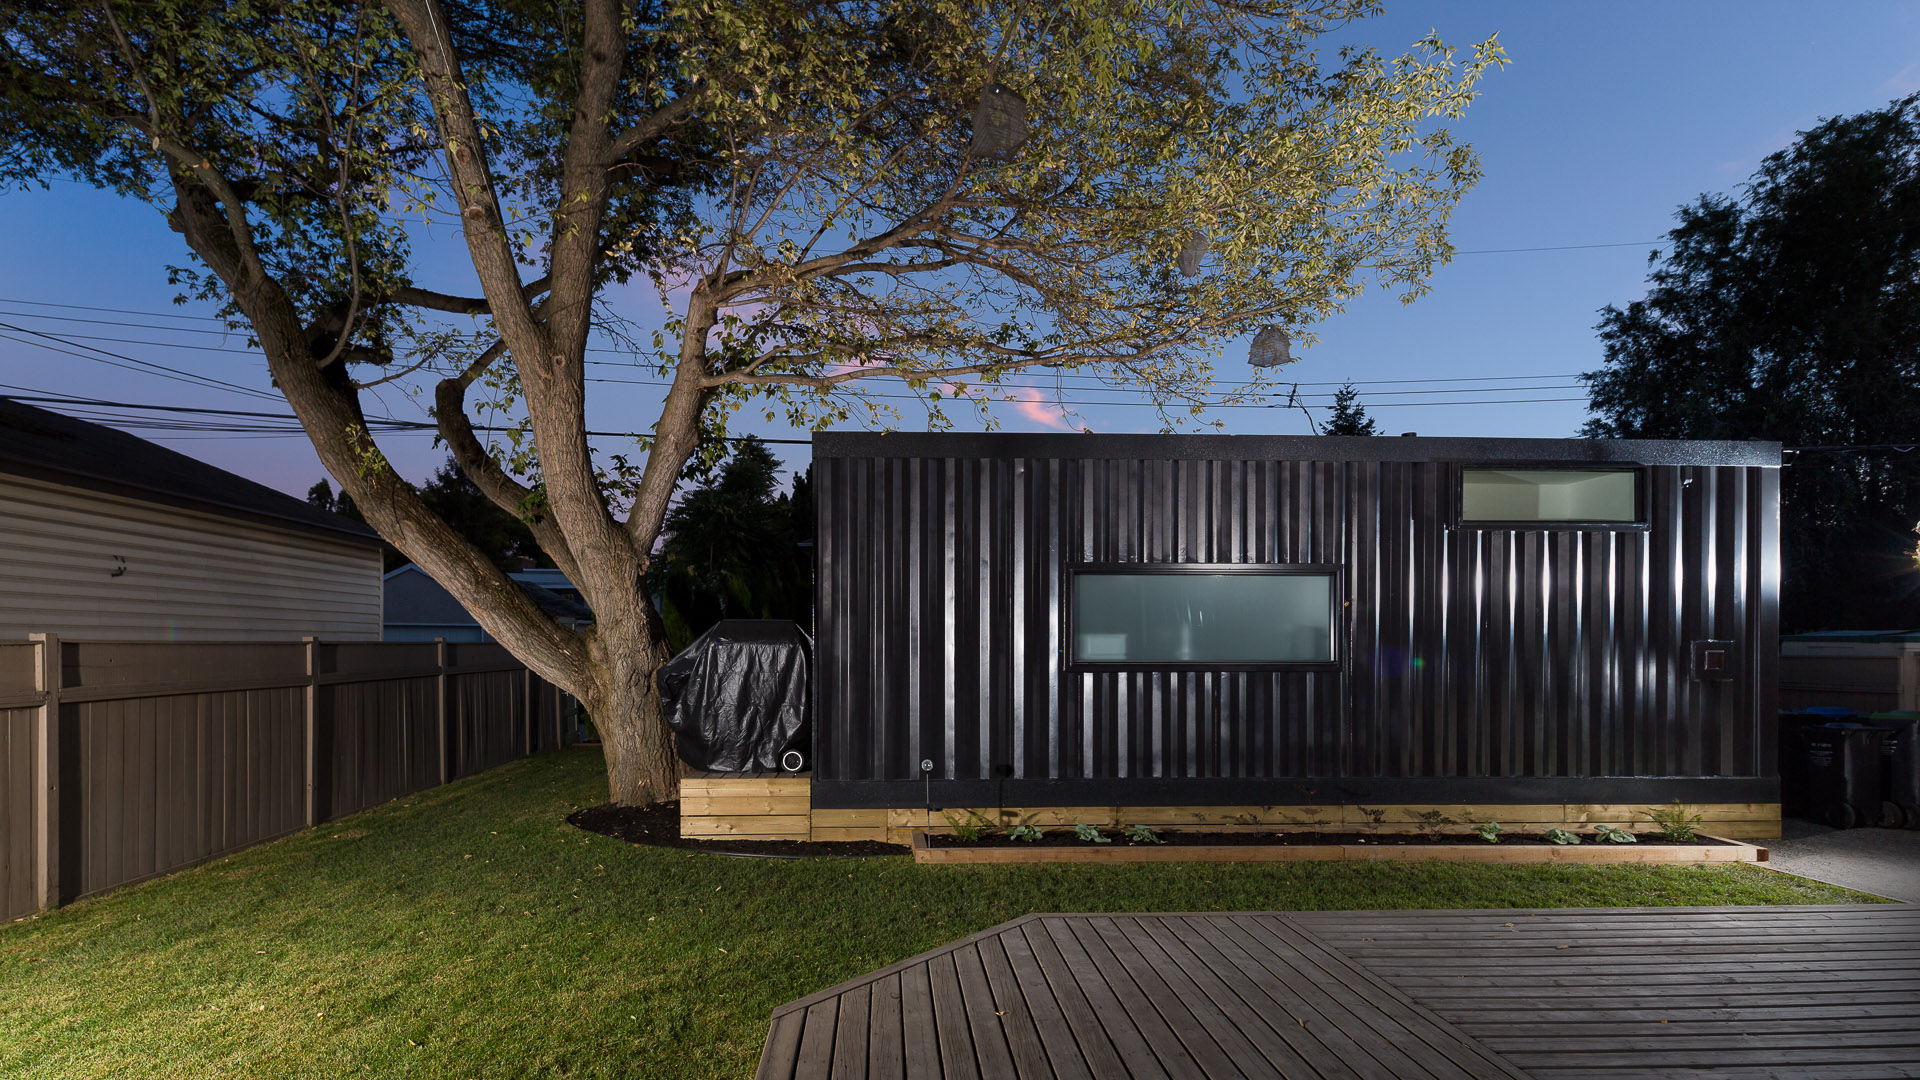 Exterior of modular home